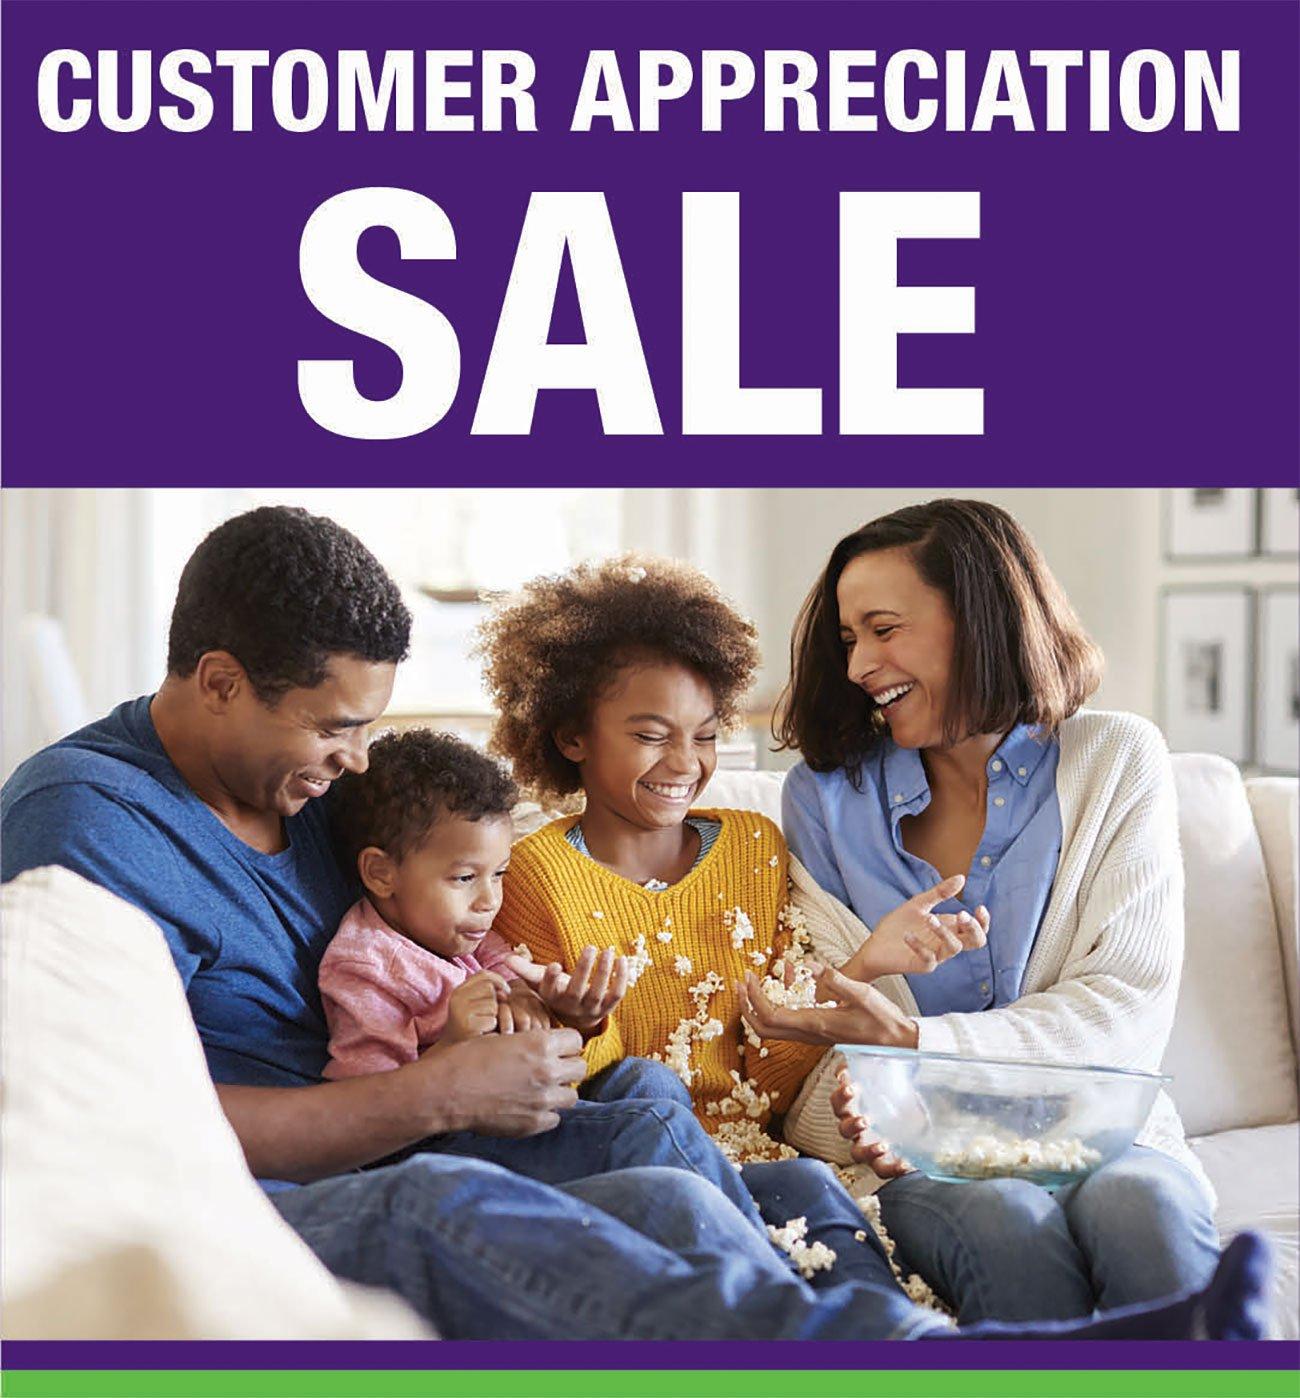 Customer-Appreciation-Family-Making-Mess